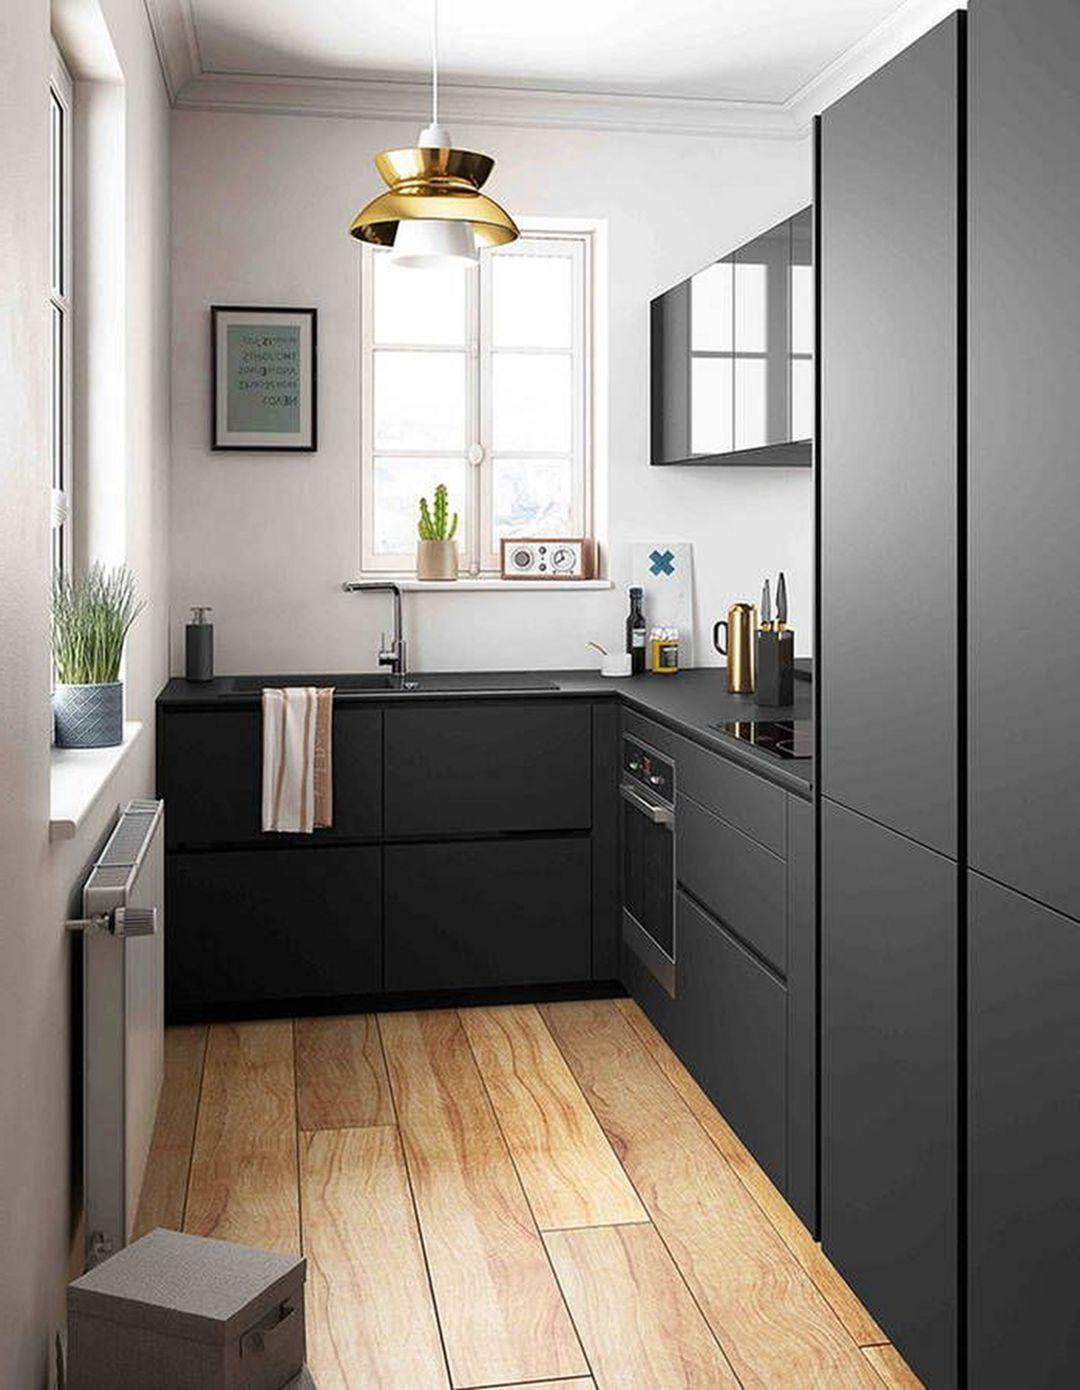 2021 small modern kitchen ideas (With images) Konyhai